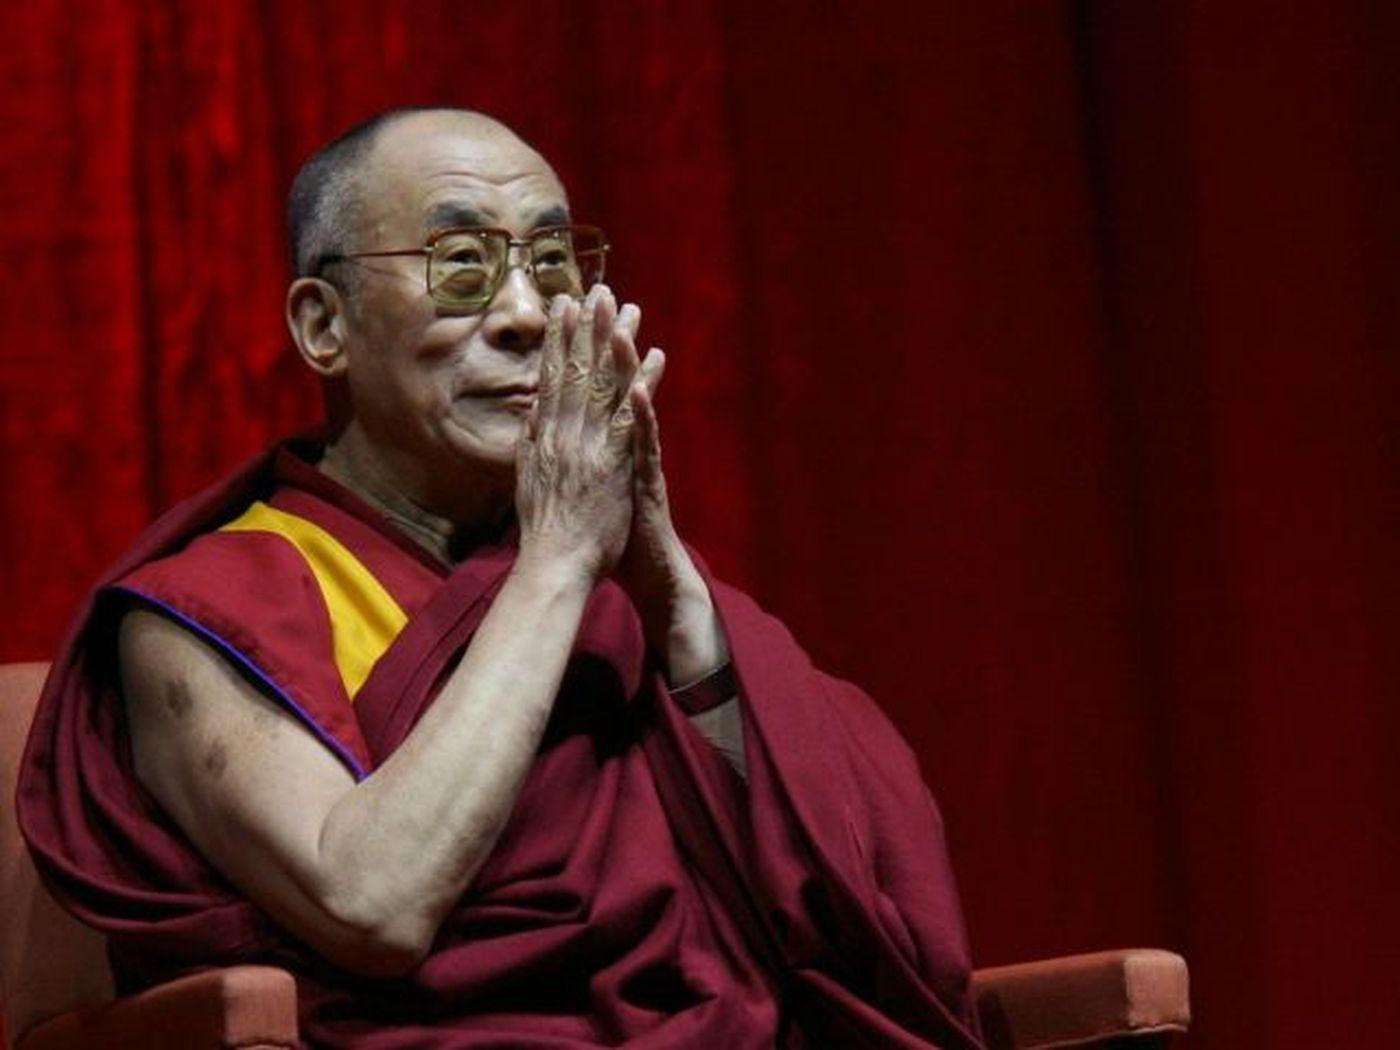 Dalai Lama scheduled to come to Birmingham walpaper